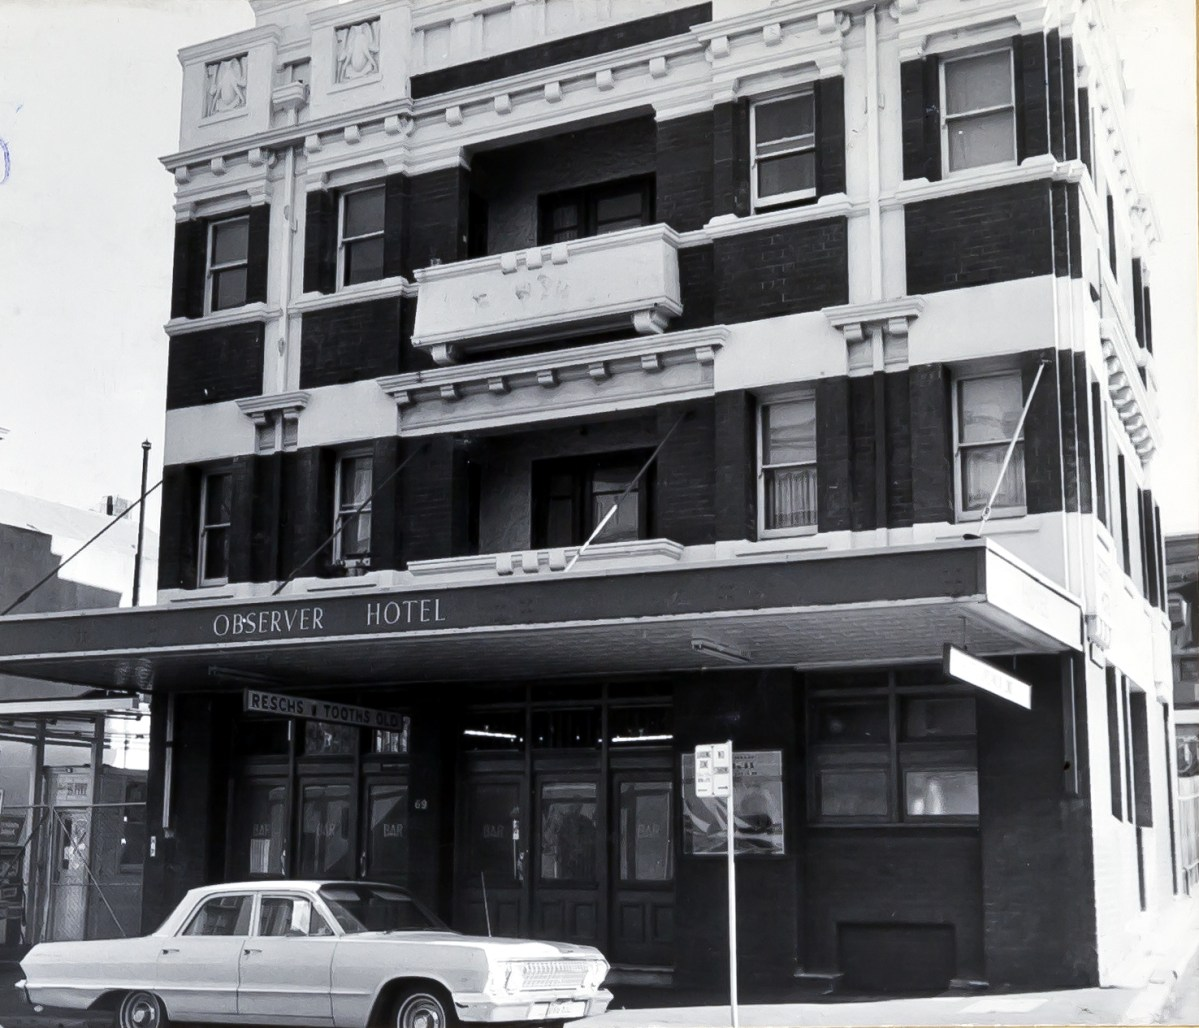 Observer Hotel, The Rocks Sydney